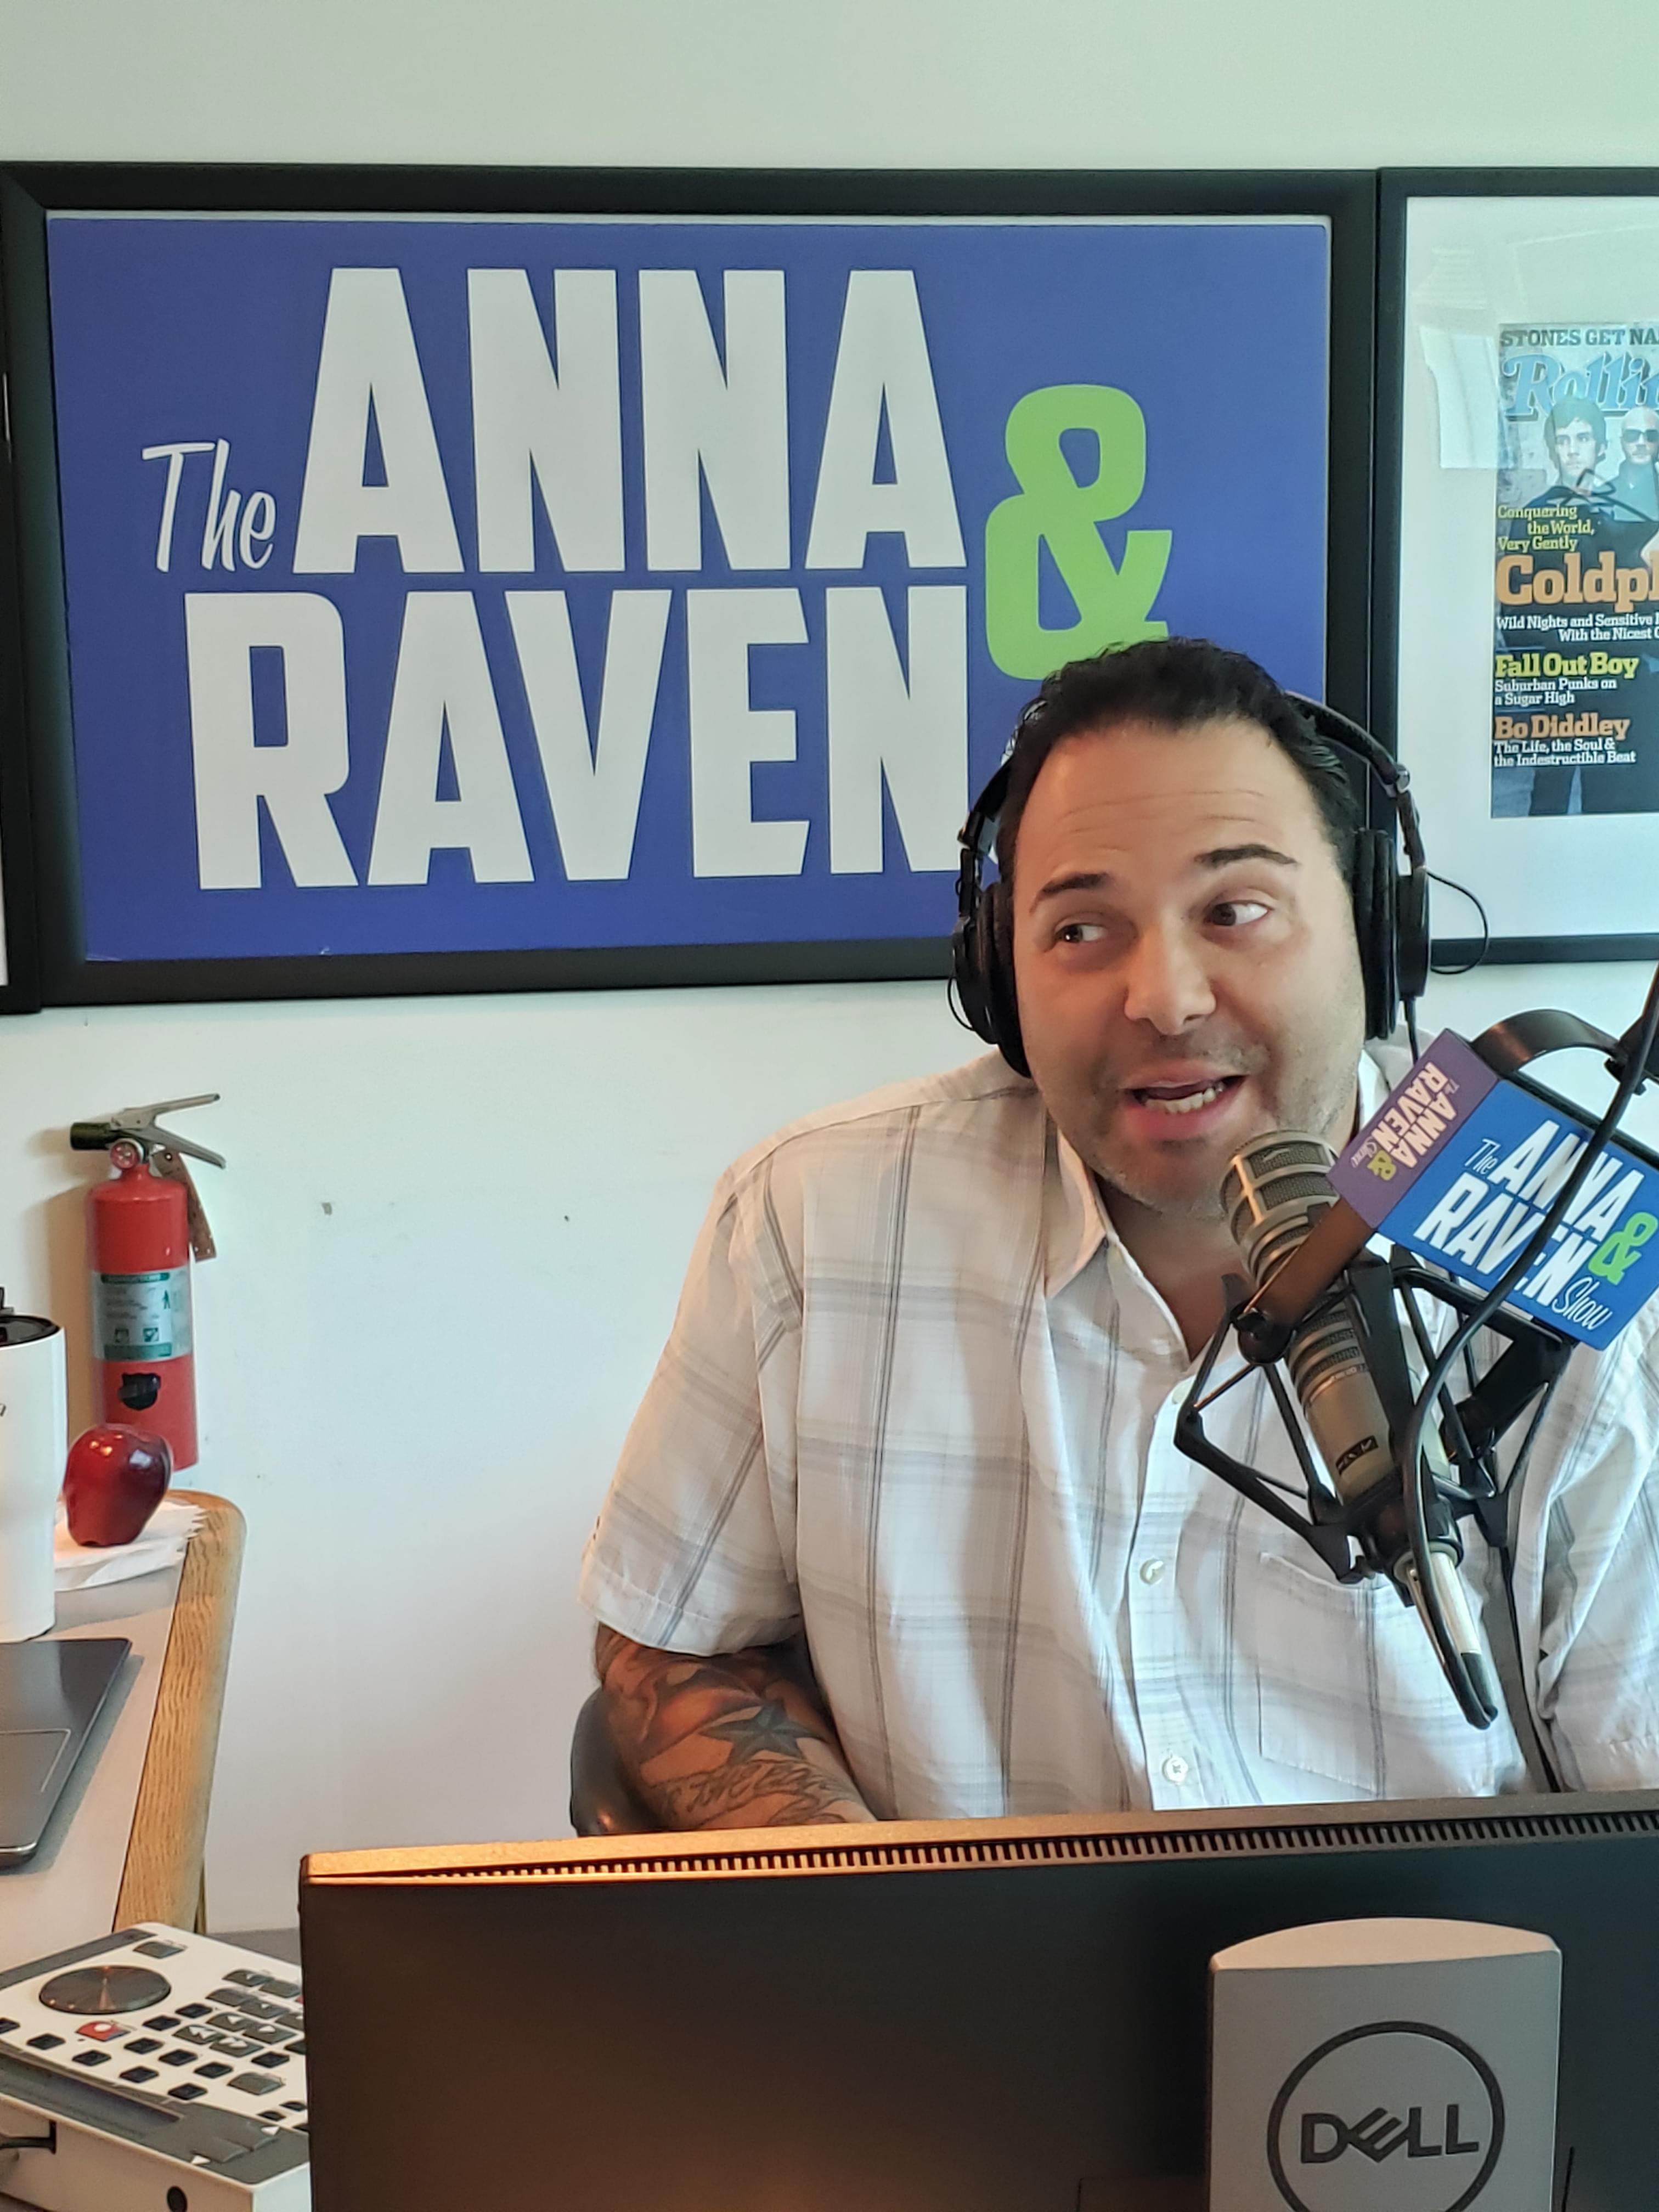 Can't Beat Raven: Raven Dated Scarlett Johansson?